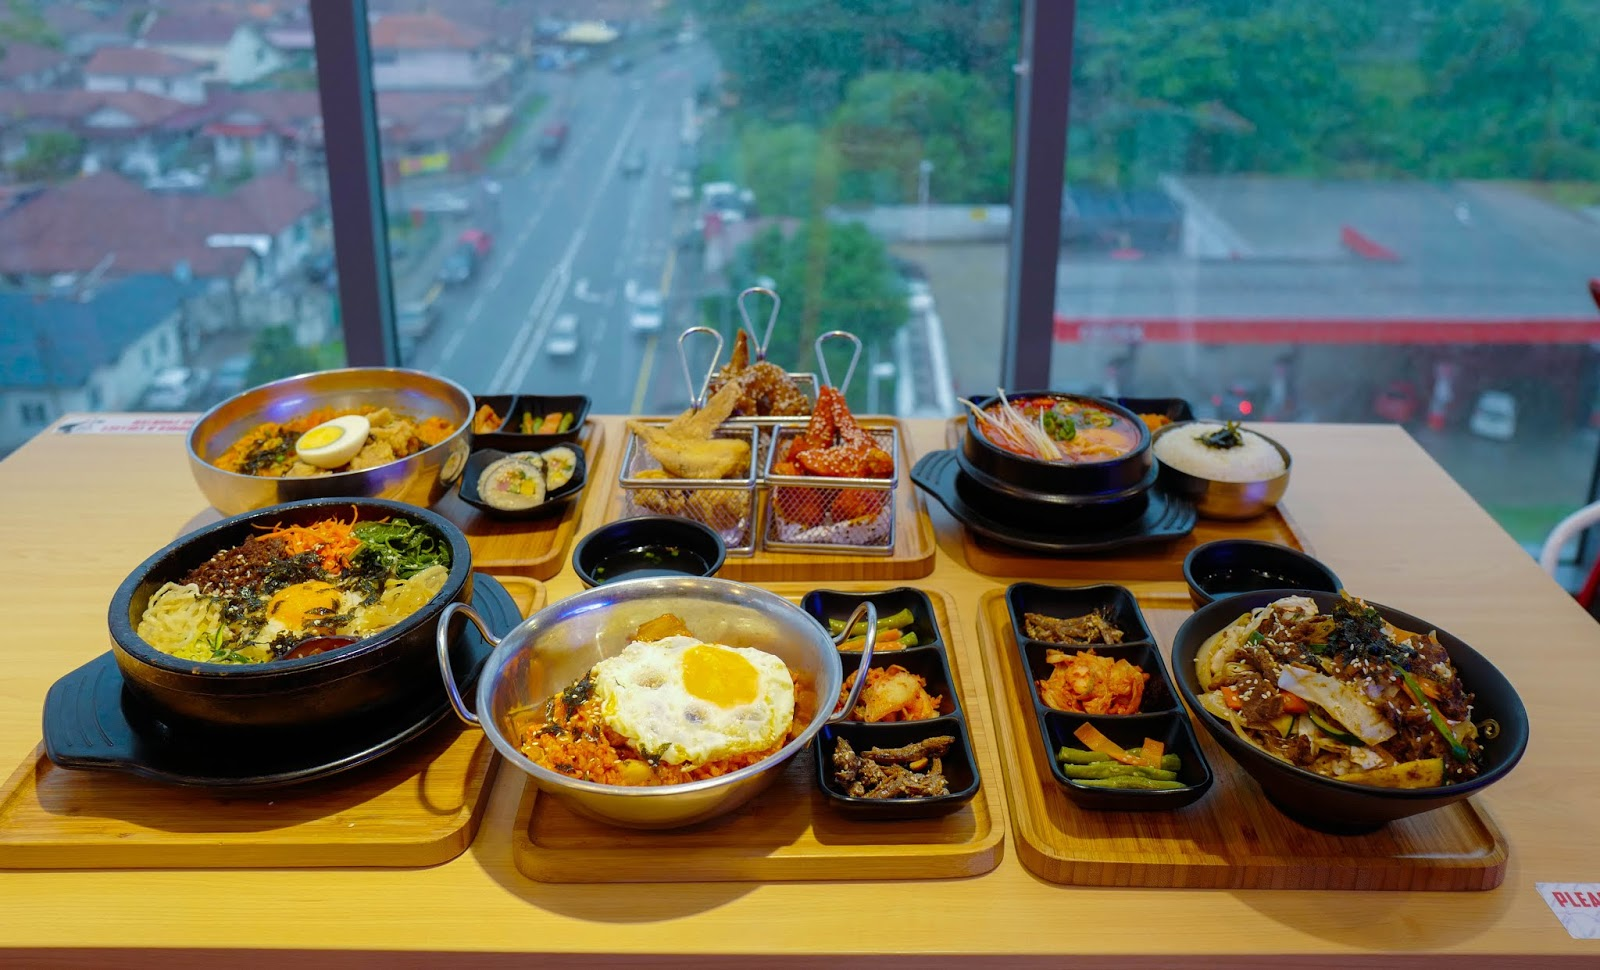 sunway velocity mall: top six korean restaurants for ramadan